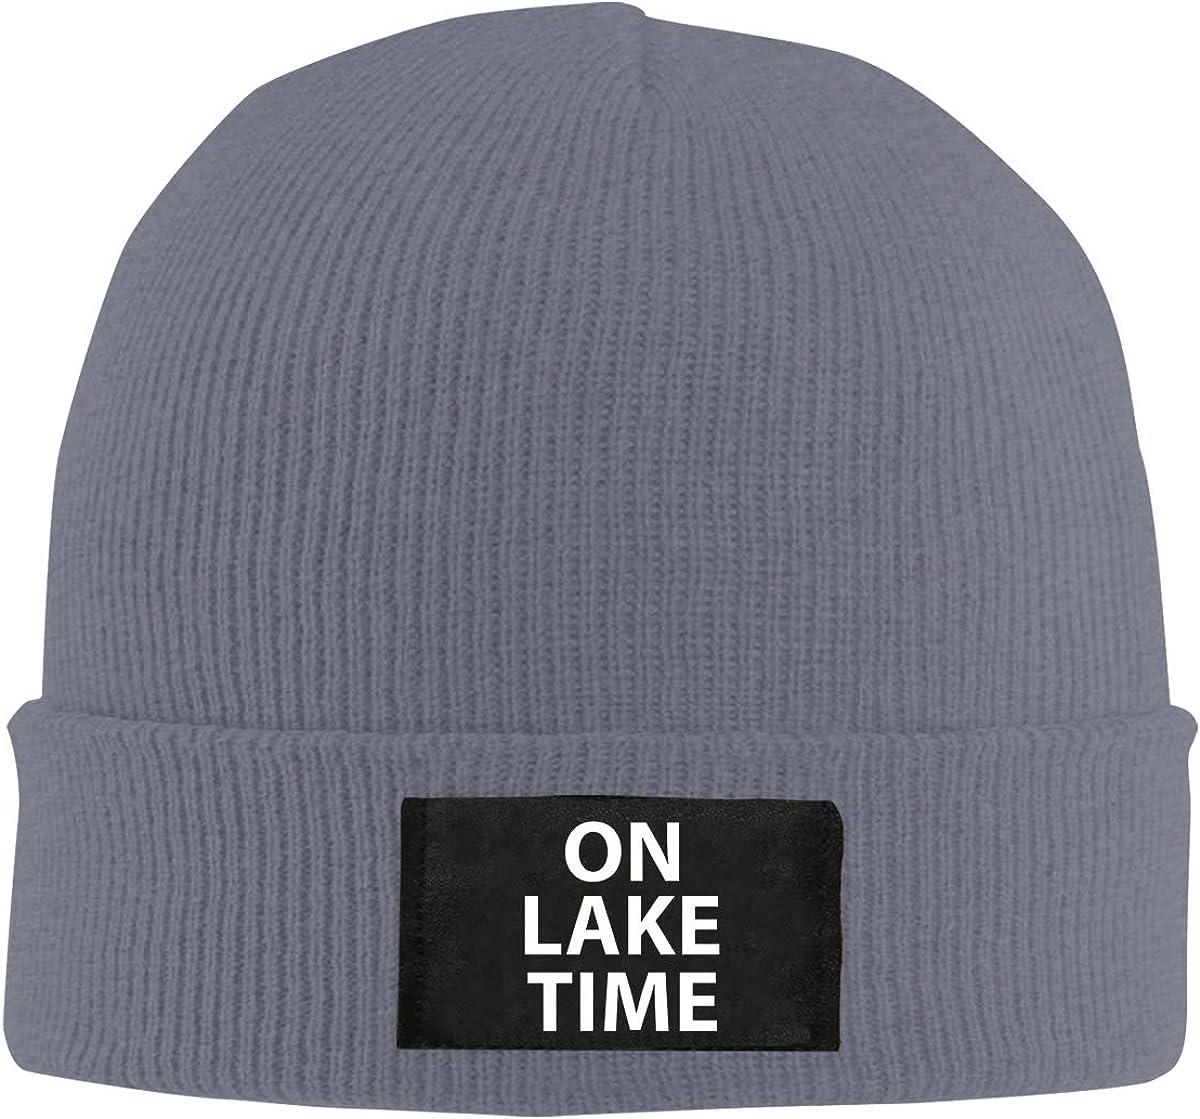 Unisex Stylish Slouch Beanie Hats Black On Lake Time Top Level Beanie Men Women